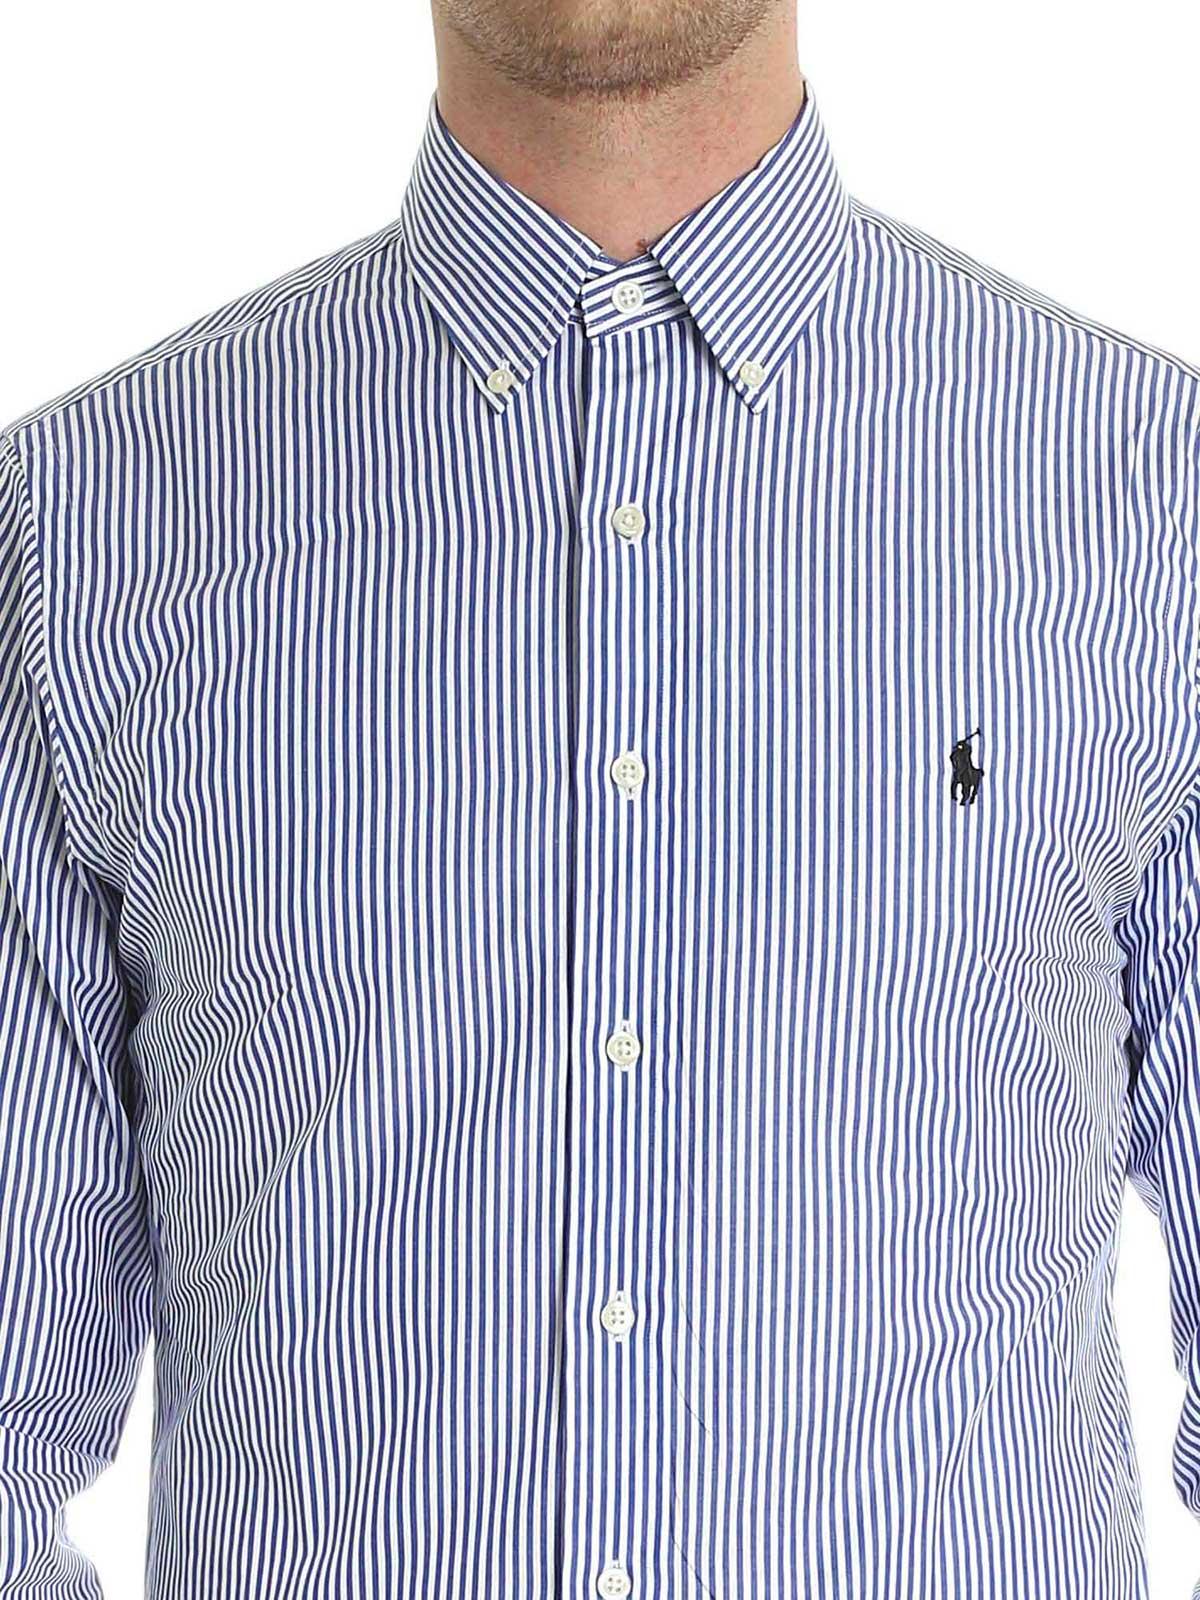 Picture of POLO RALPH LAUREN | Men's Striped Slim Fit Shirt